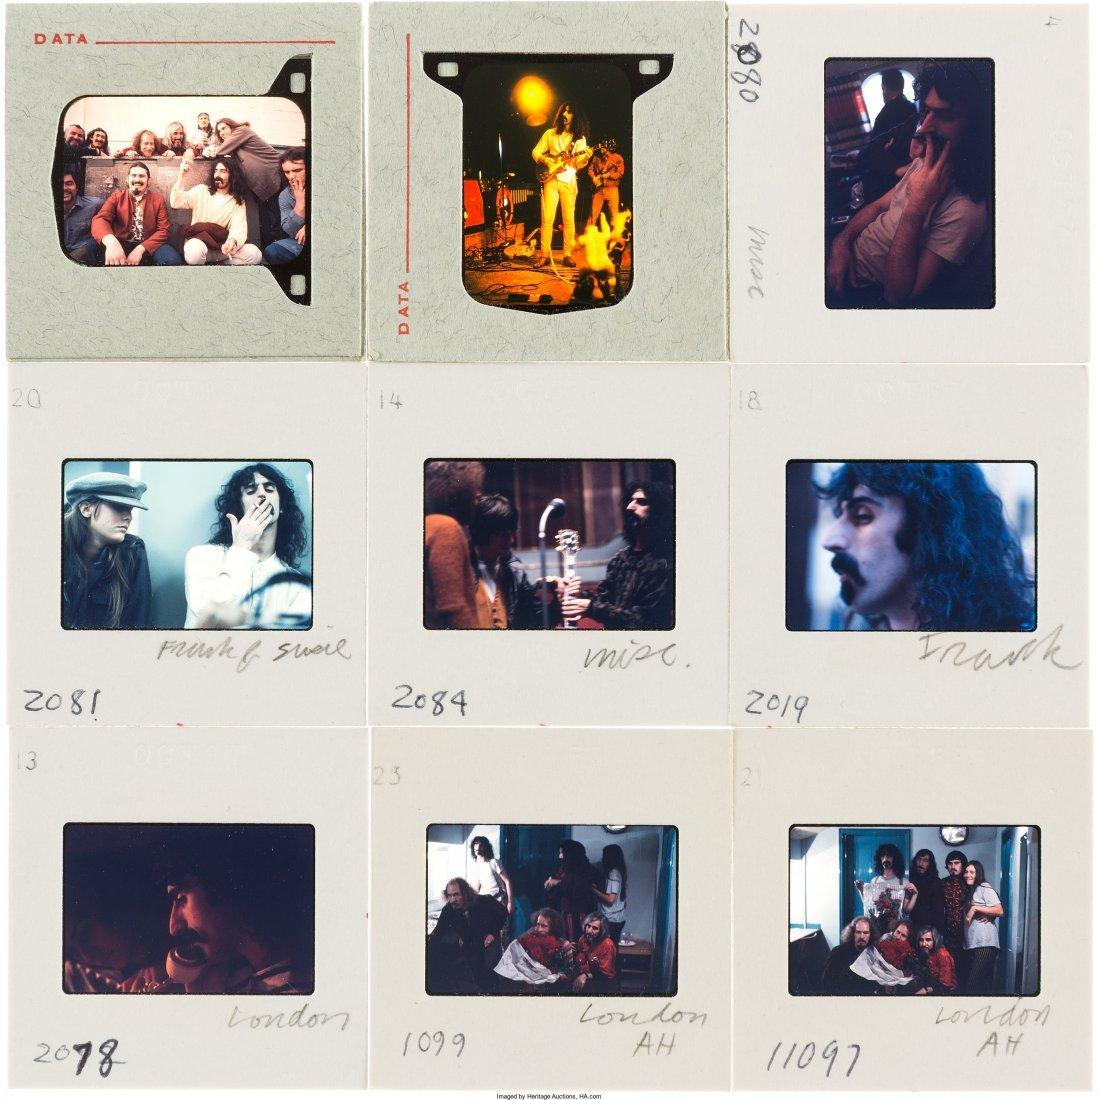 89578: Frank Zappa - Set of Fifty Color Photo Slides (L